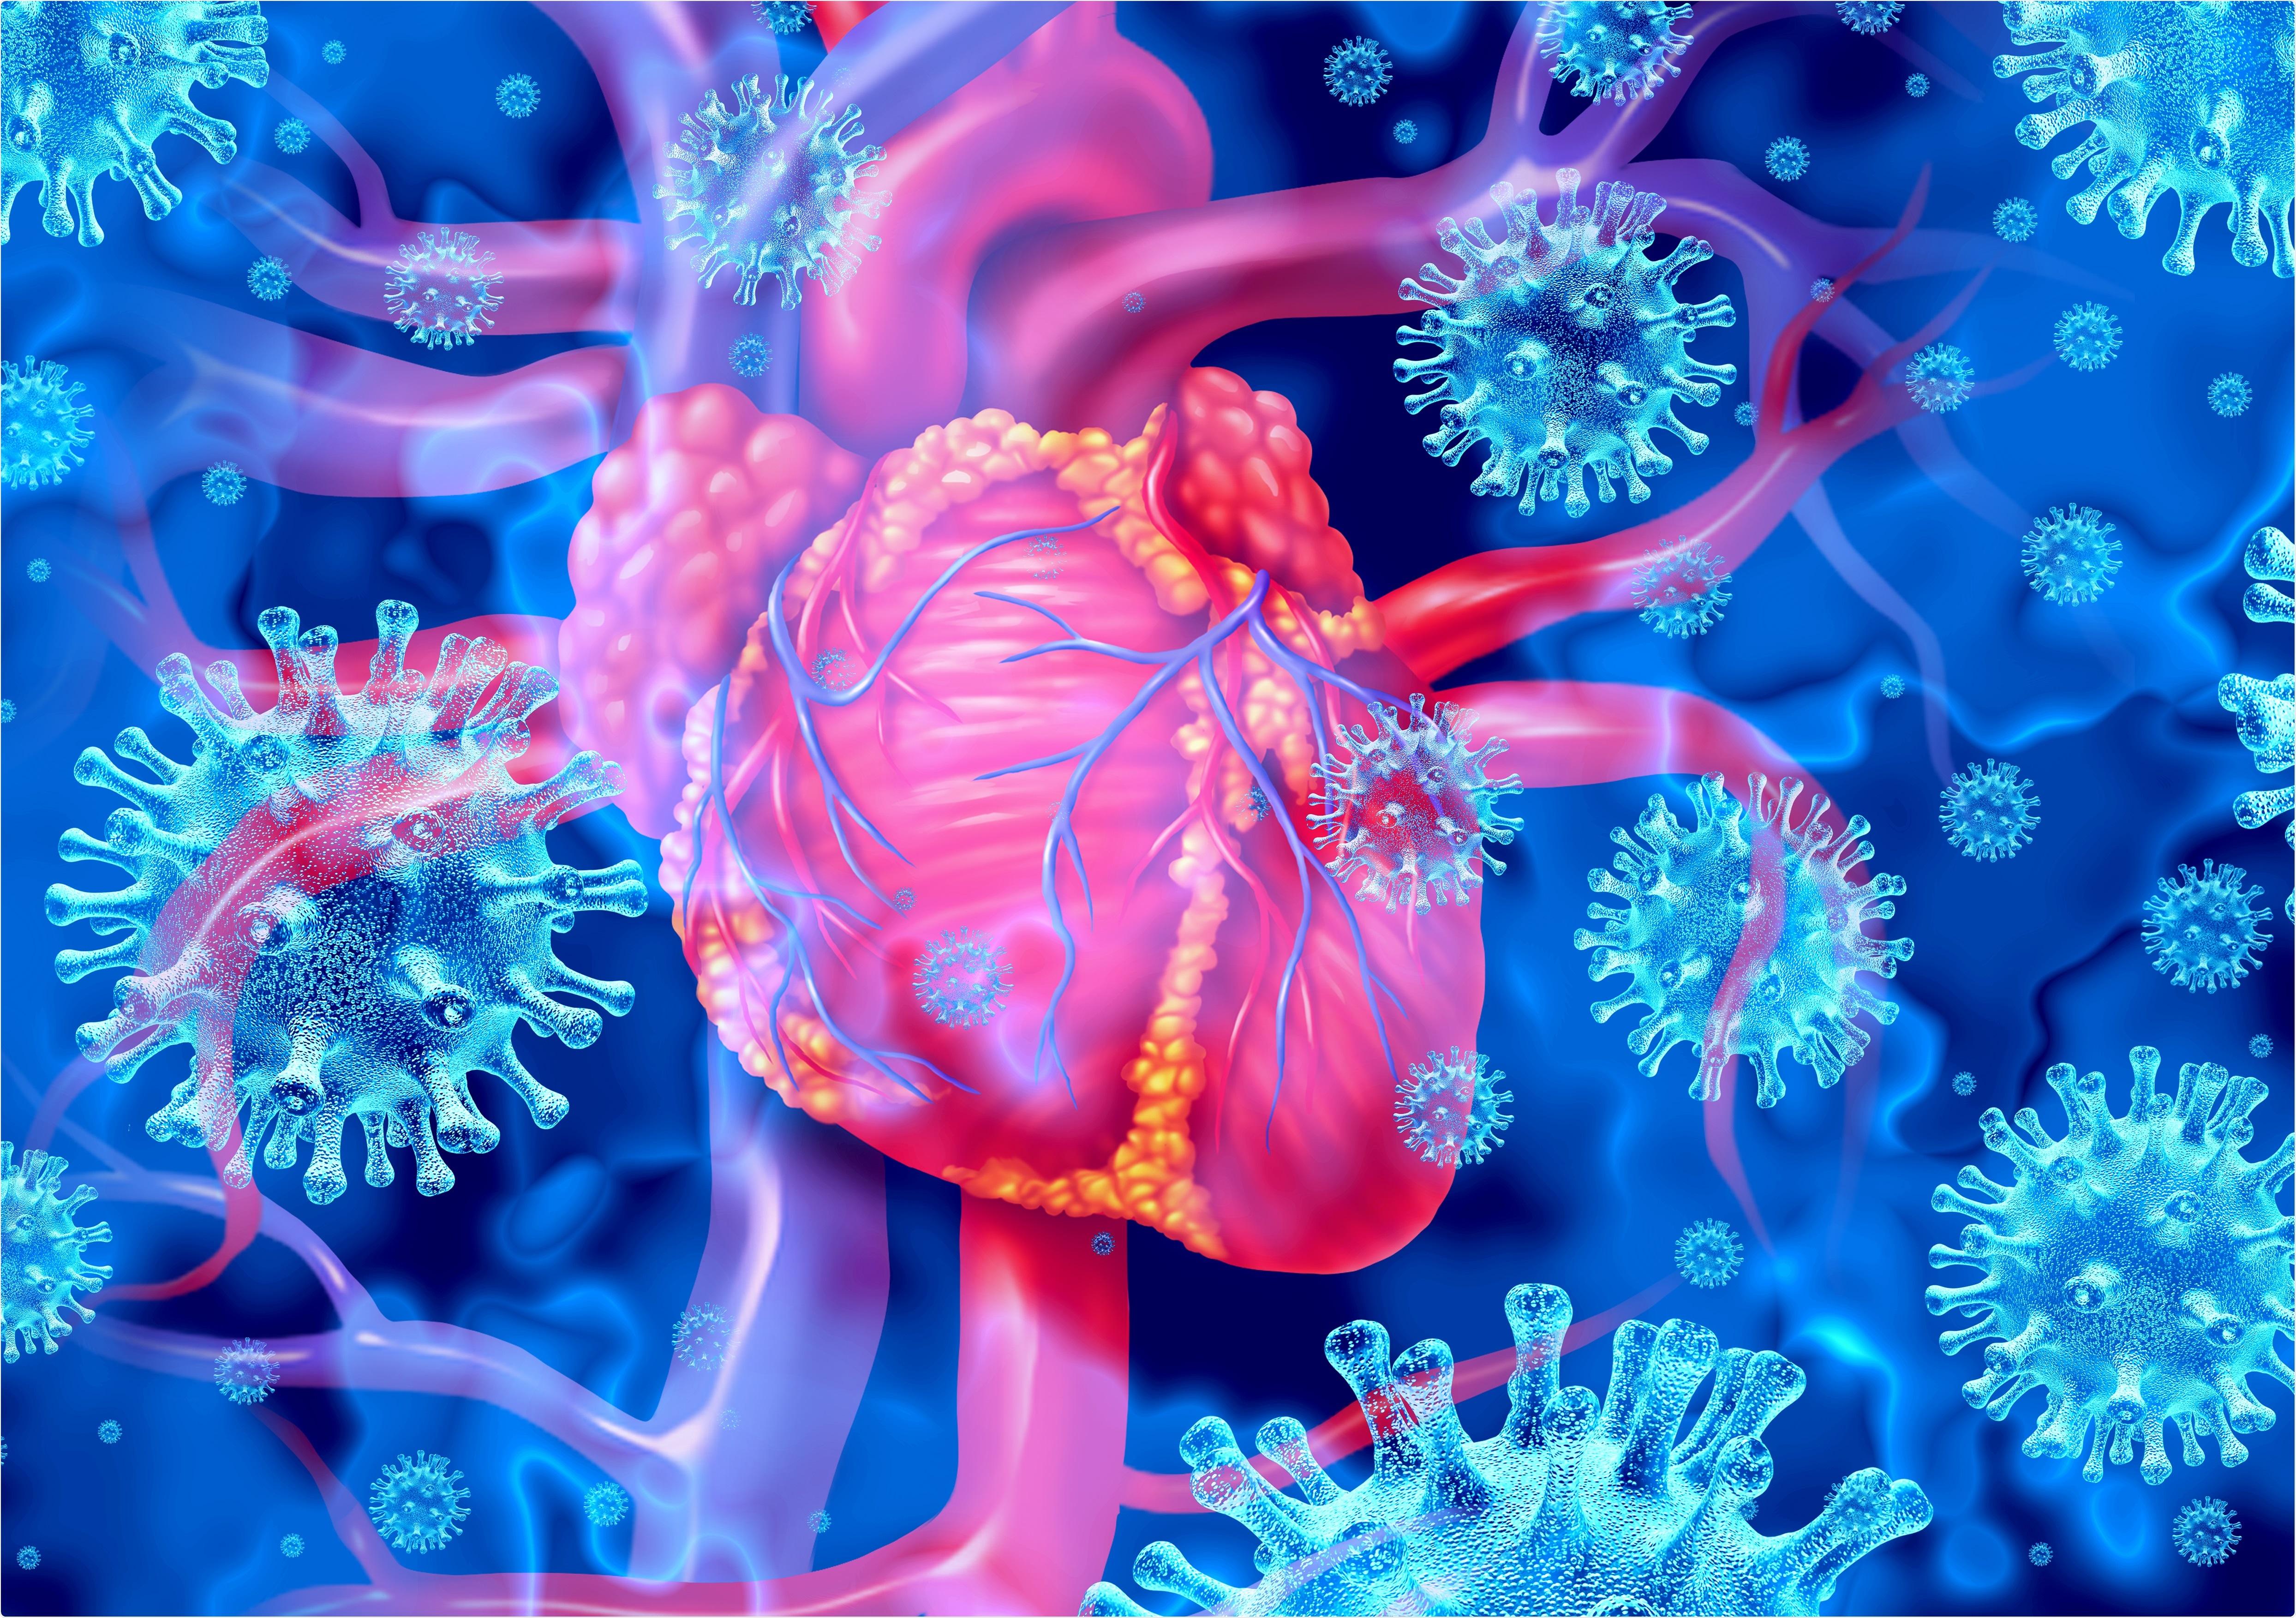 www.news-medical.net